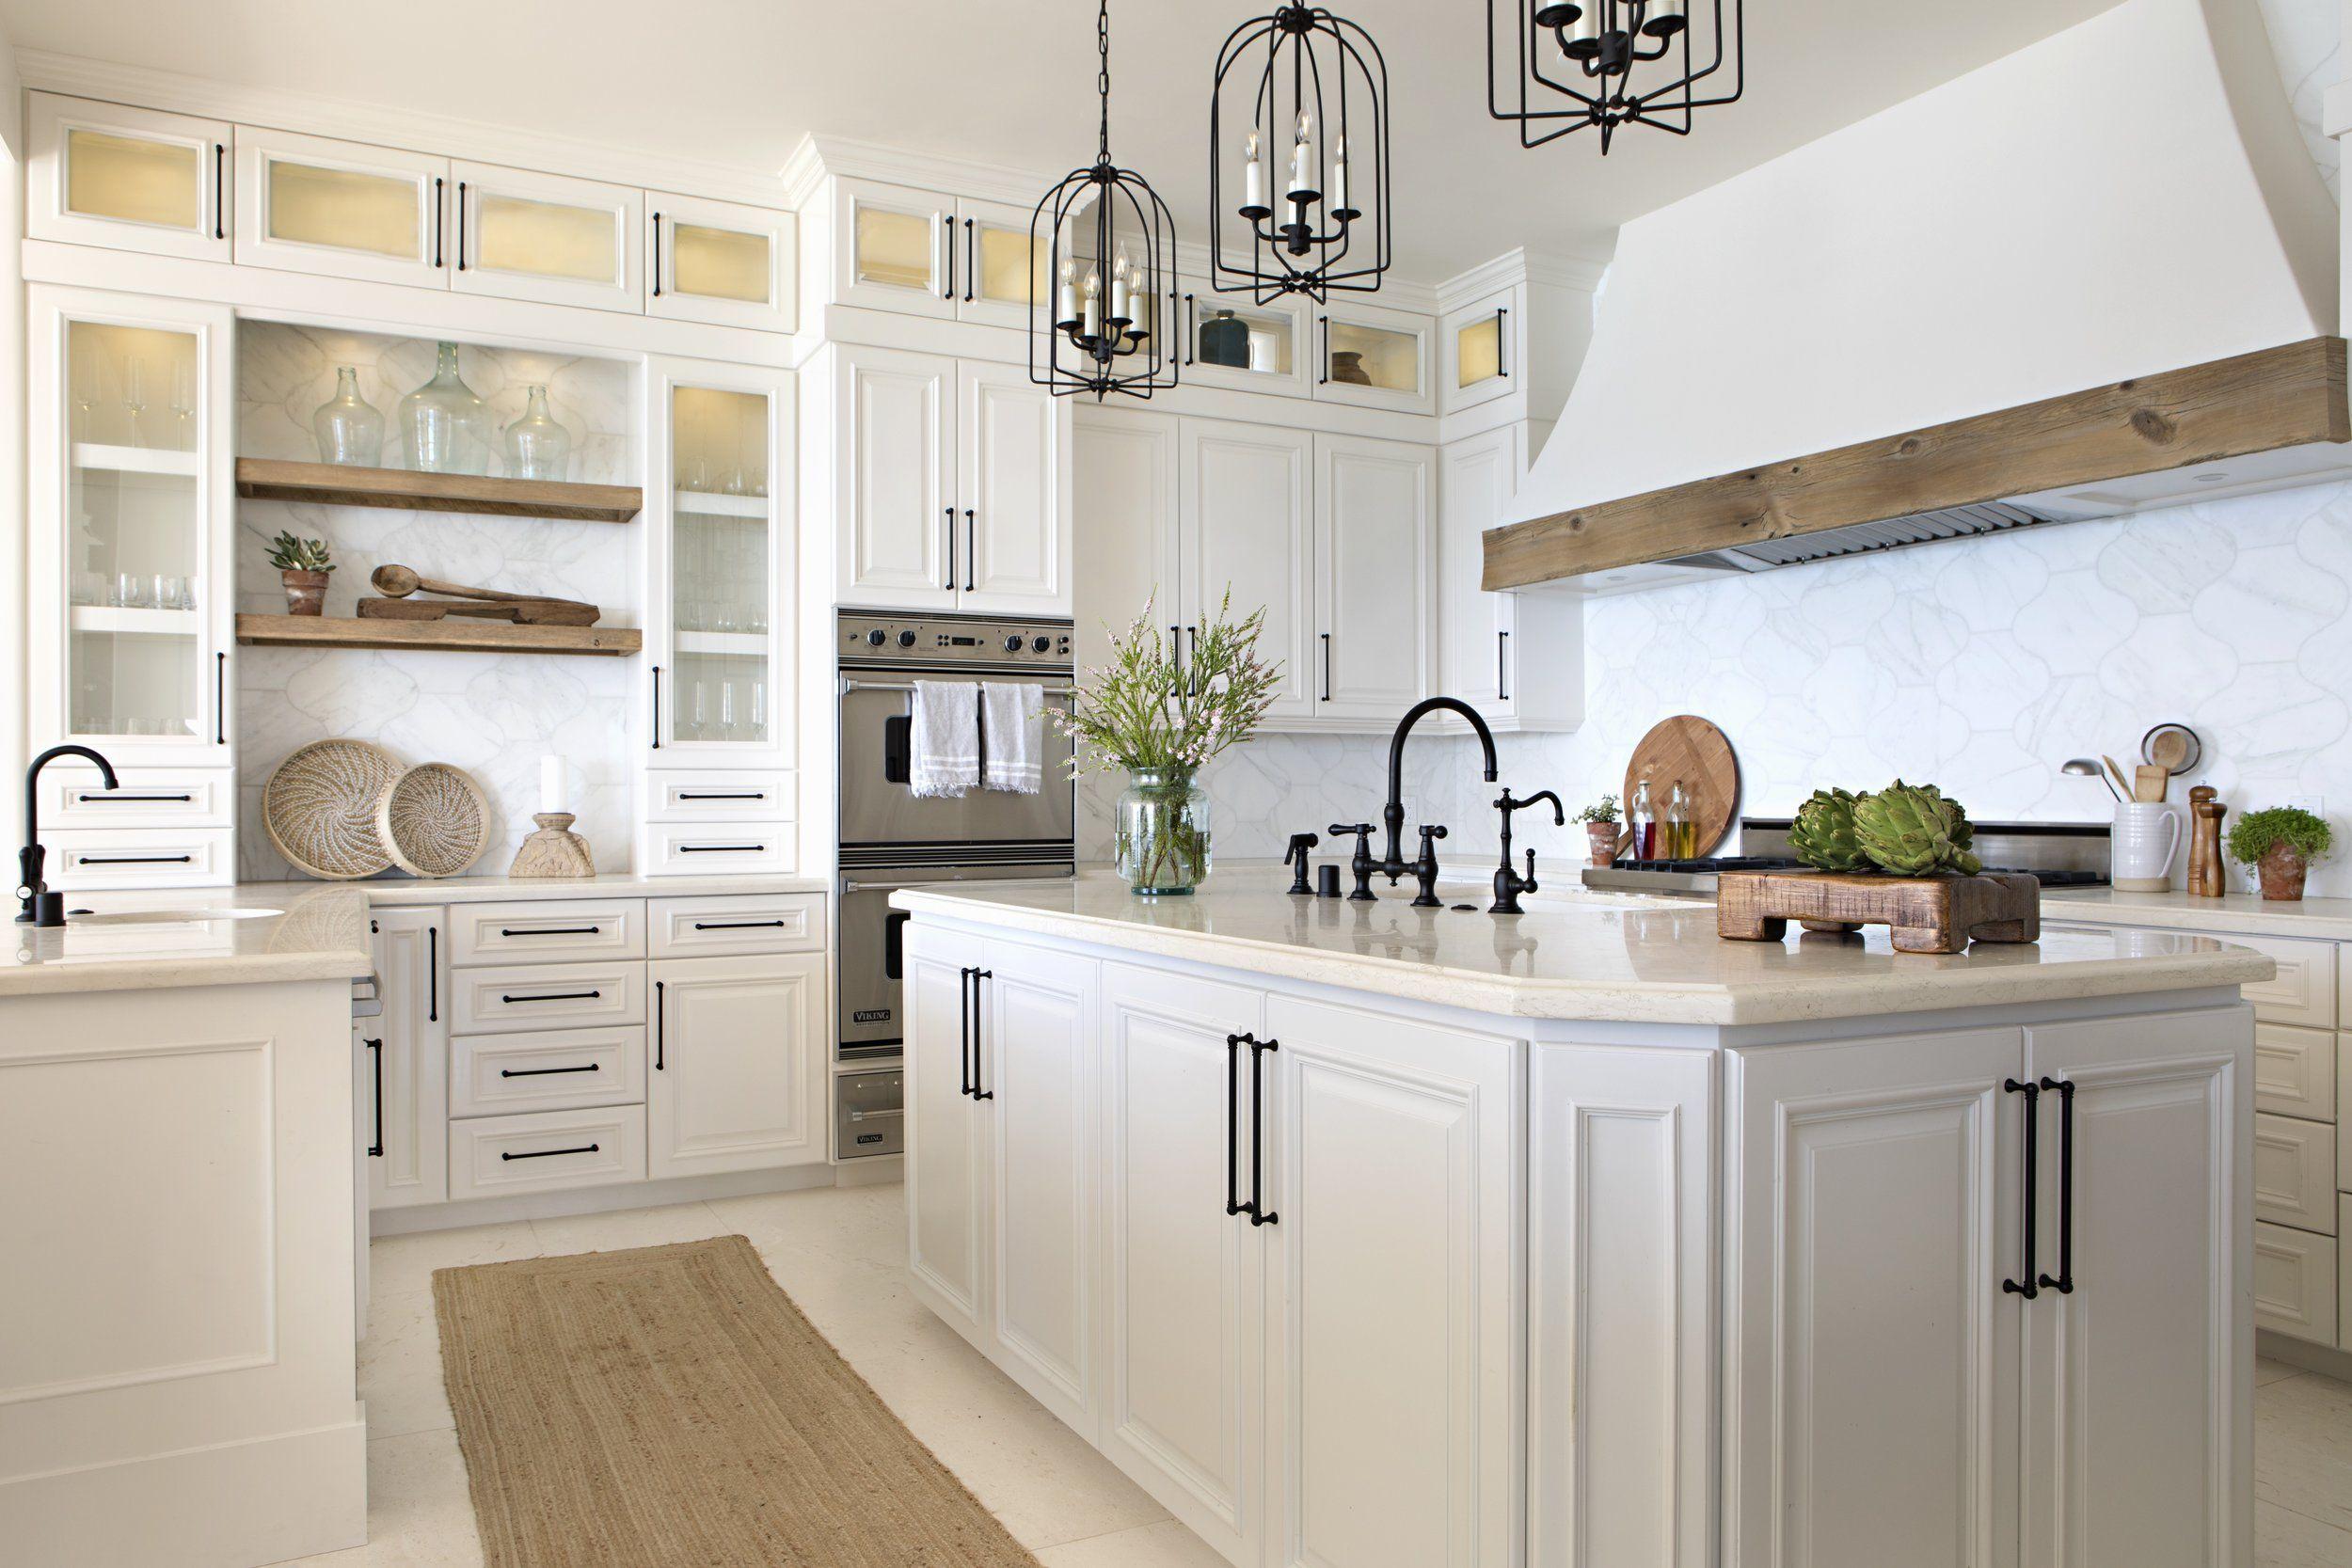 House Tour Beautiful Seaside Harmony Kitchen Design Small Kitchen Inspirations White Kitchen